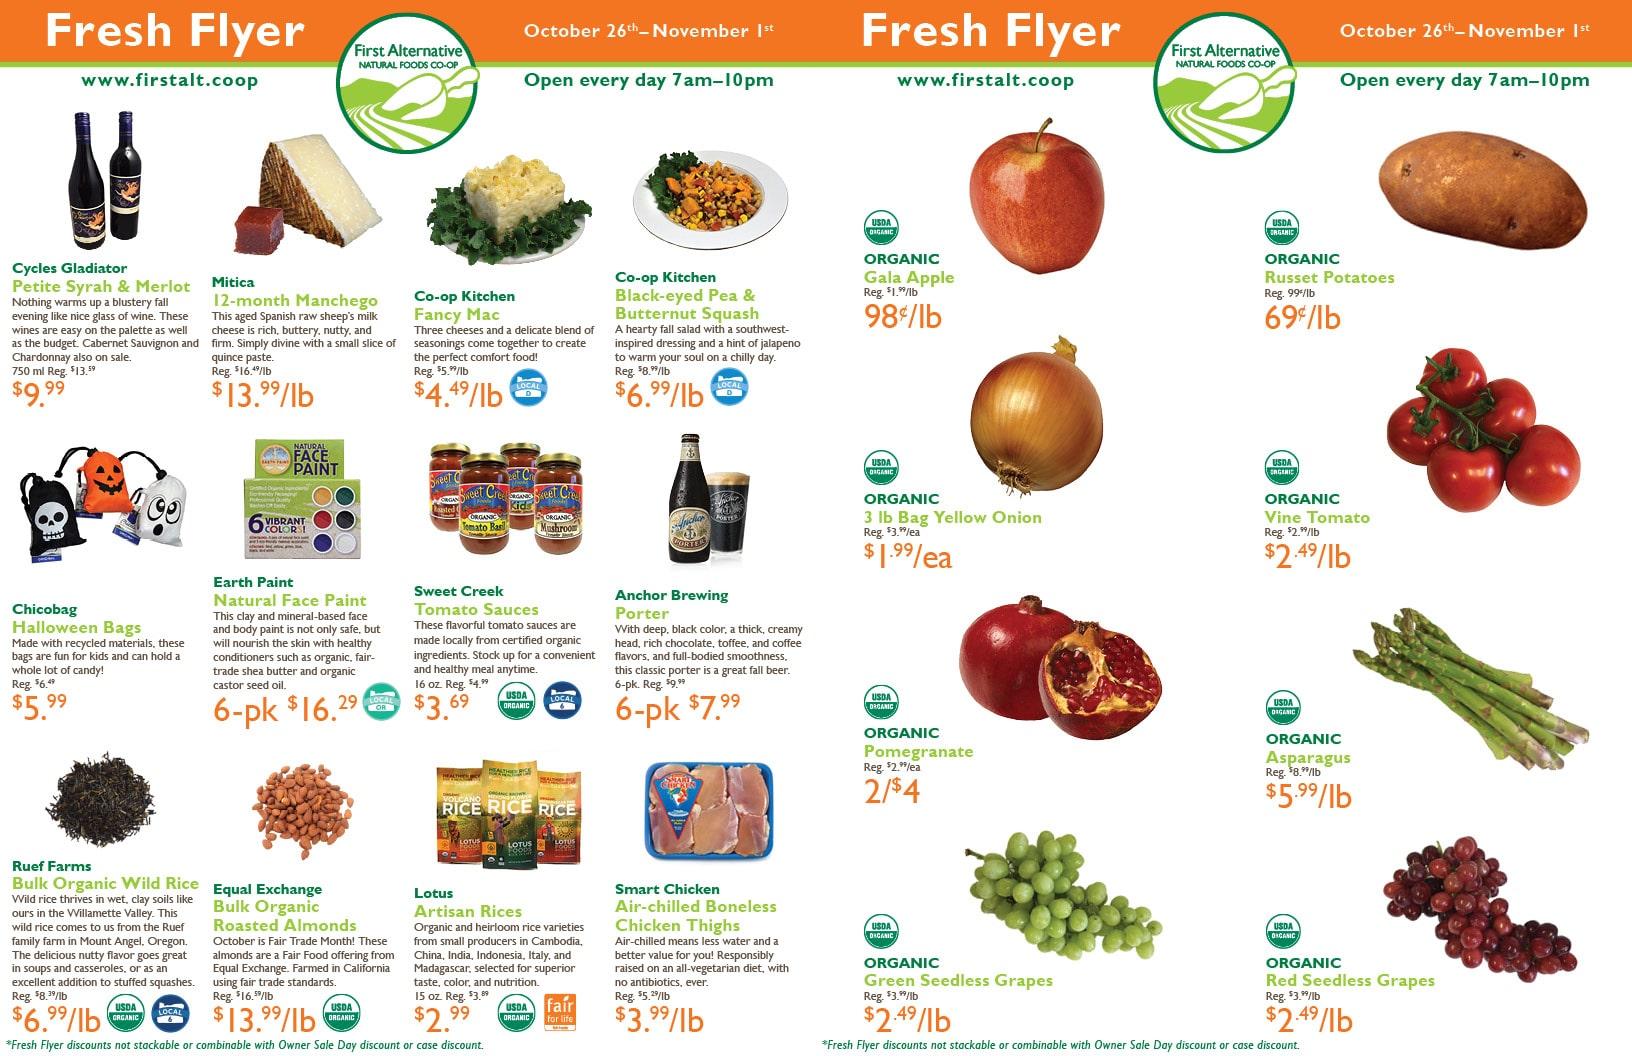 First Alternative Co-op Fresh Flyer October 26-November 1